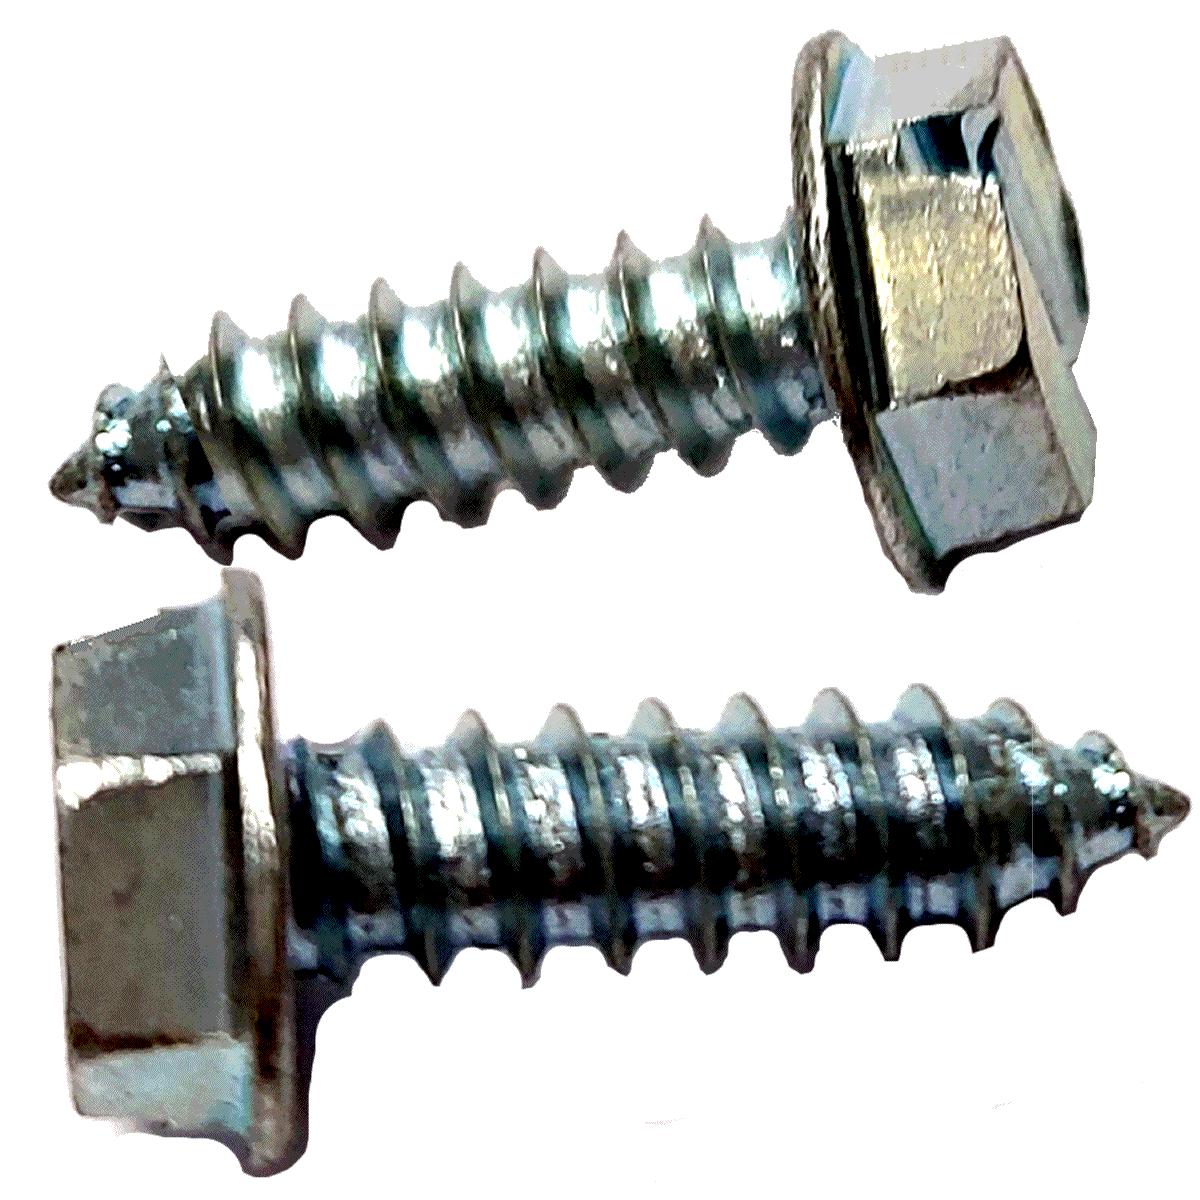 100 Parafusos Rosca Soberba 4,2x16 ou 4.8x16mm Sextavado 8mm